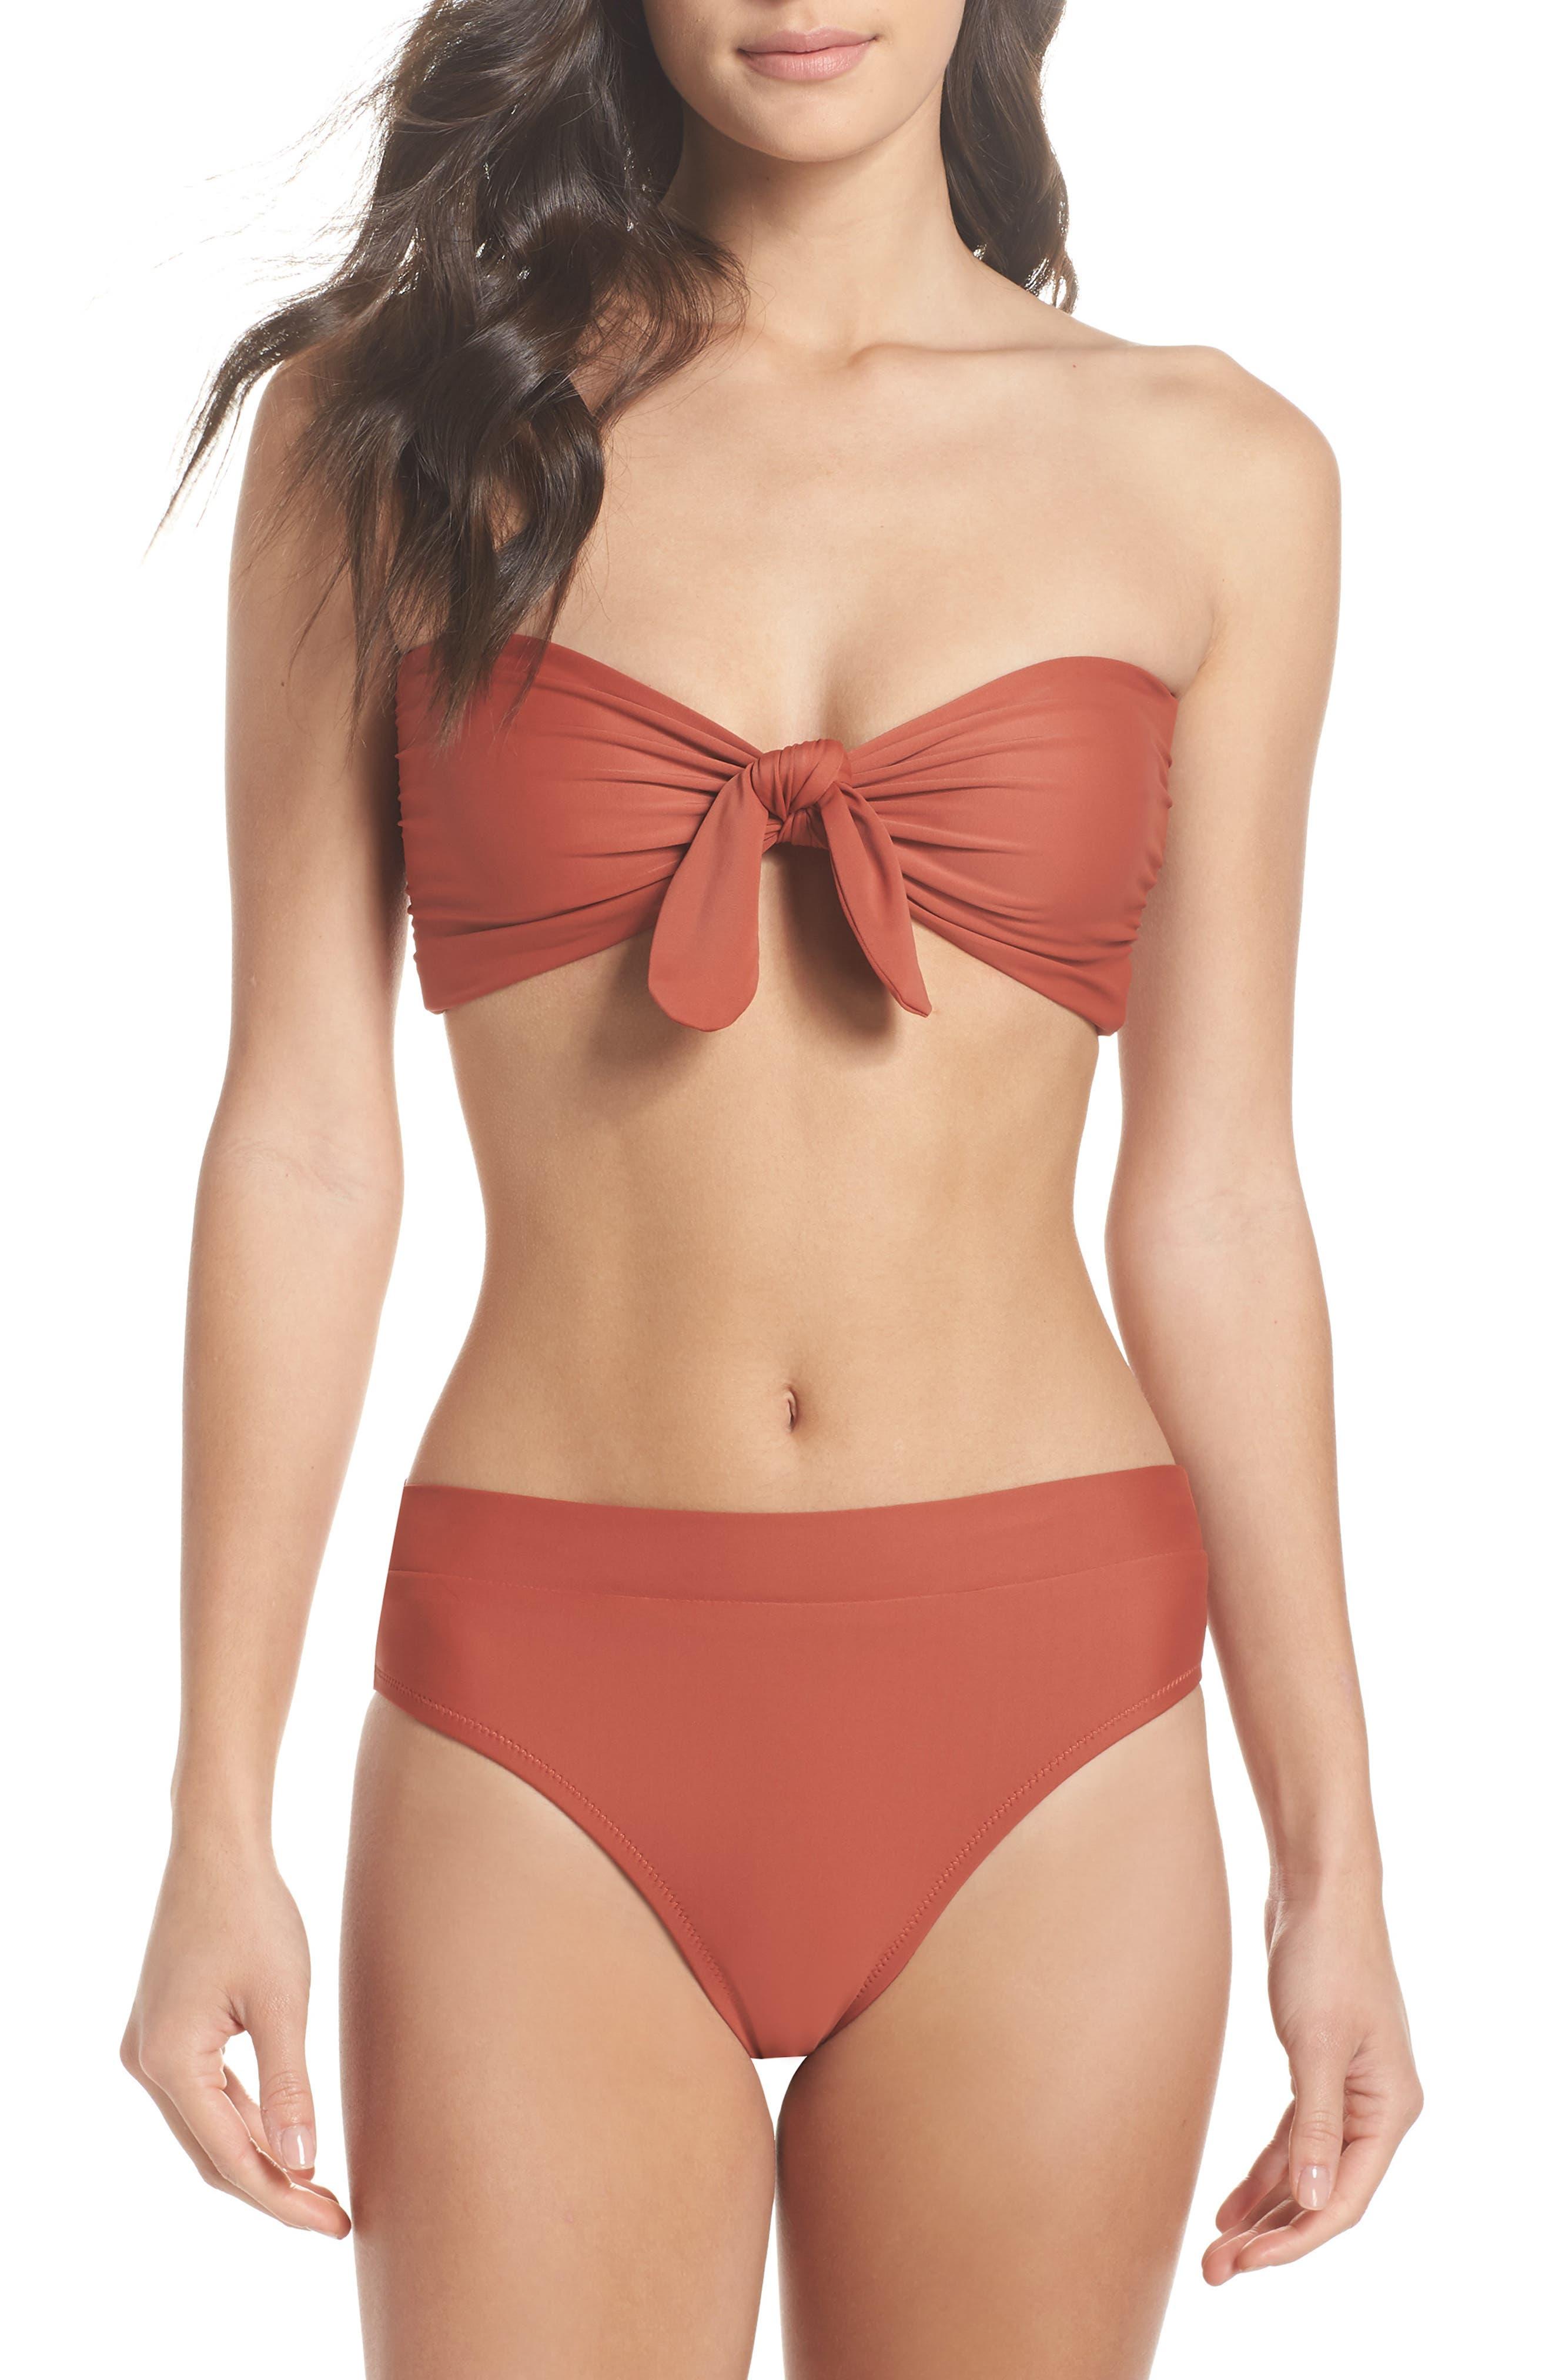 Fairfax Bandeau Bikini Top,                             Alternate thumbnail 5, color,                             Copper